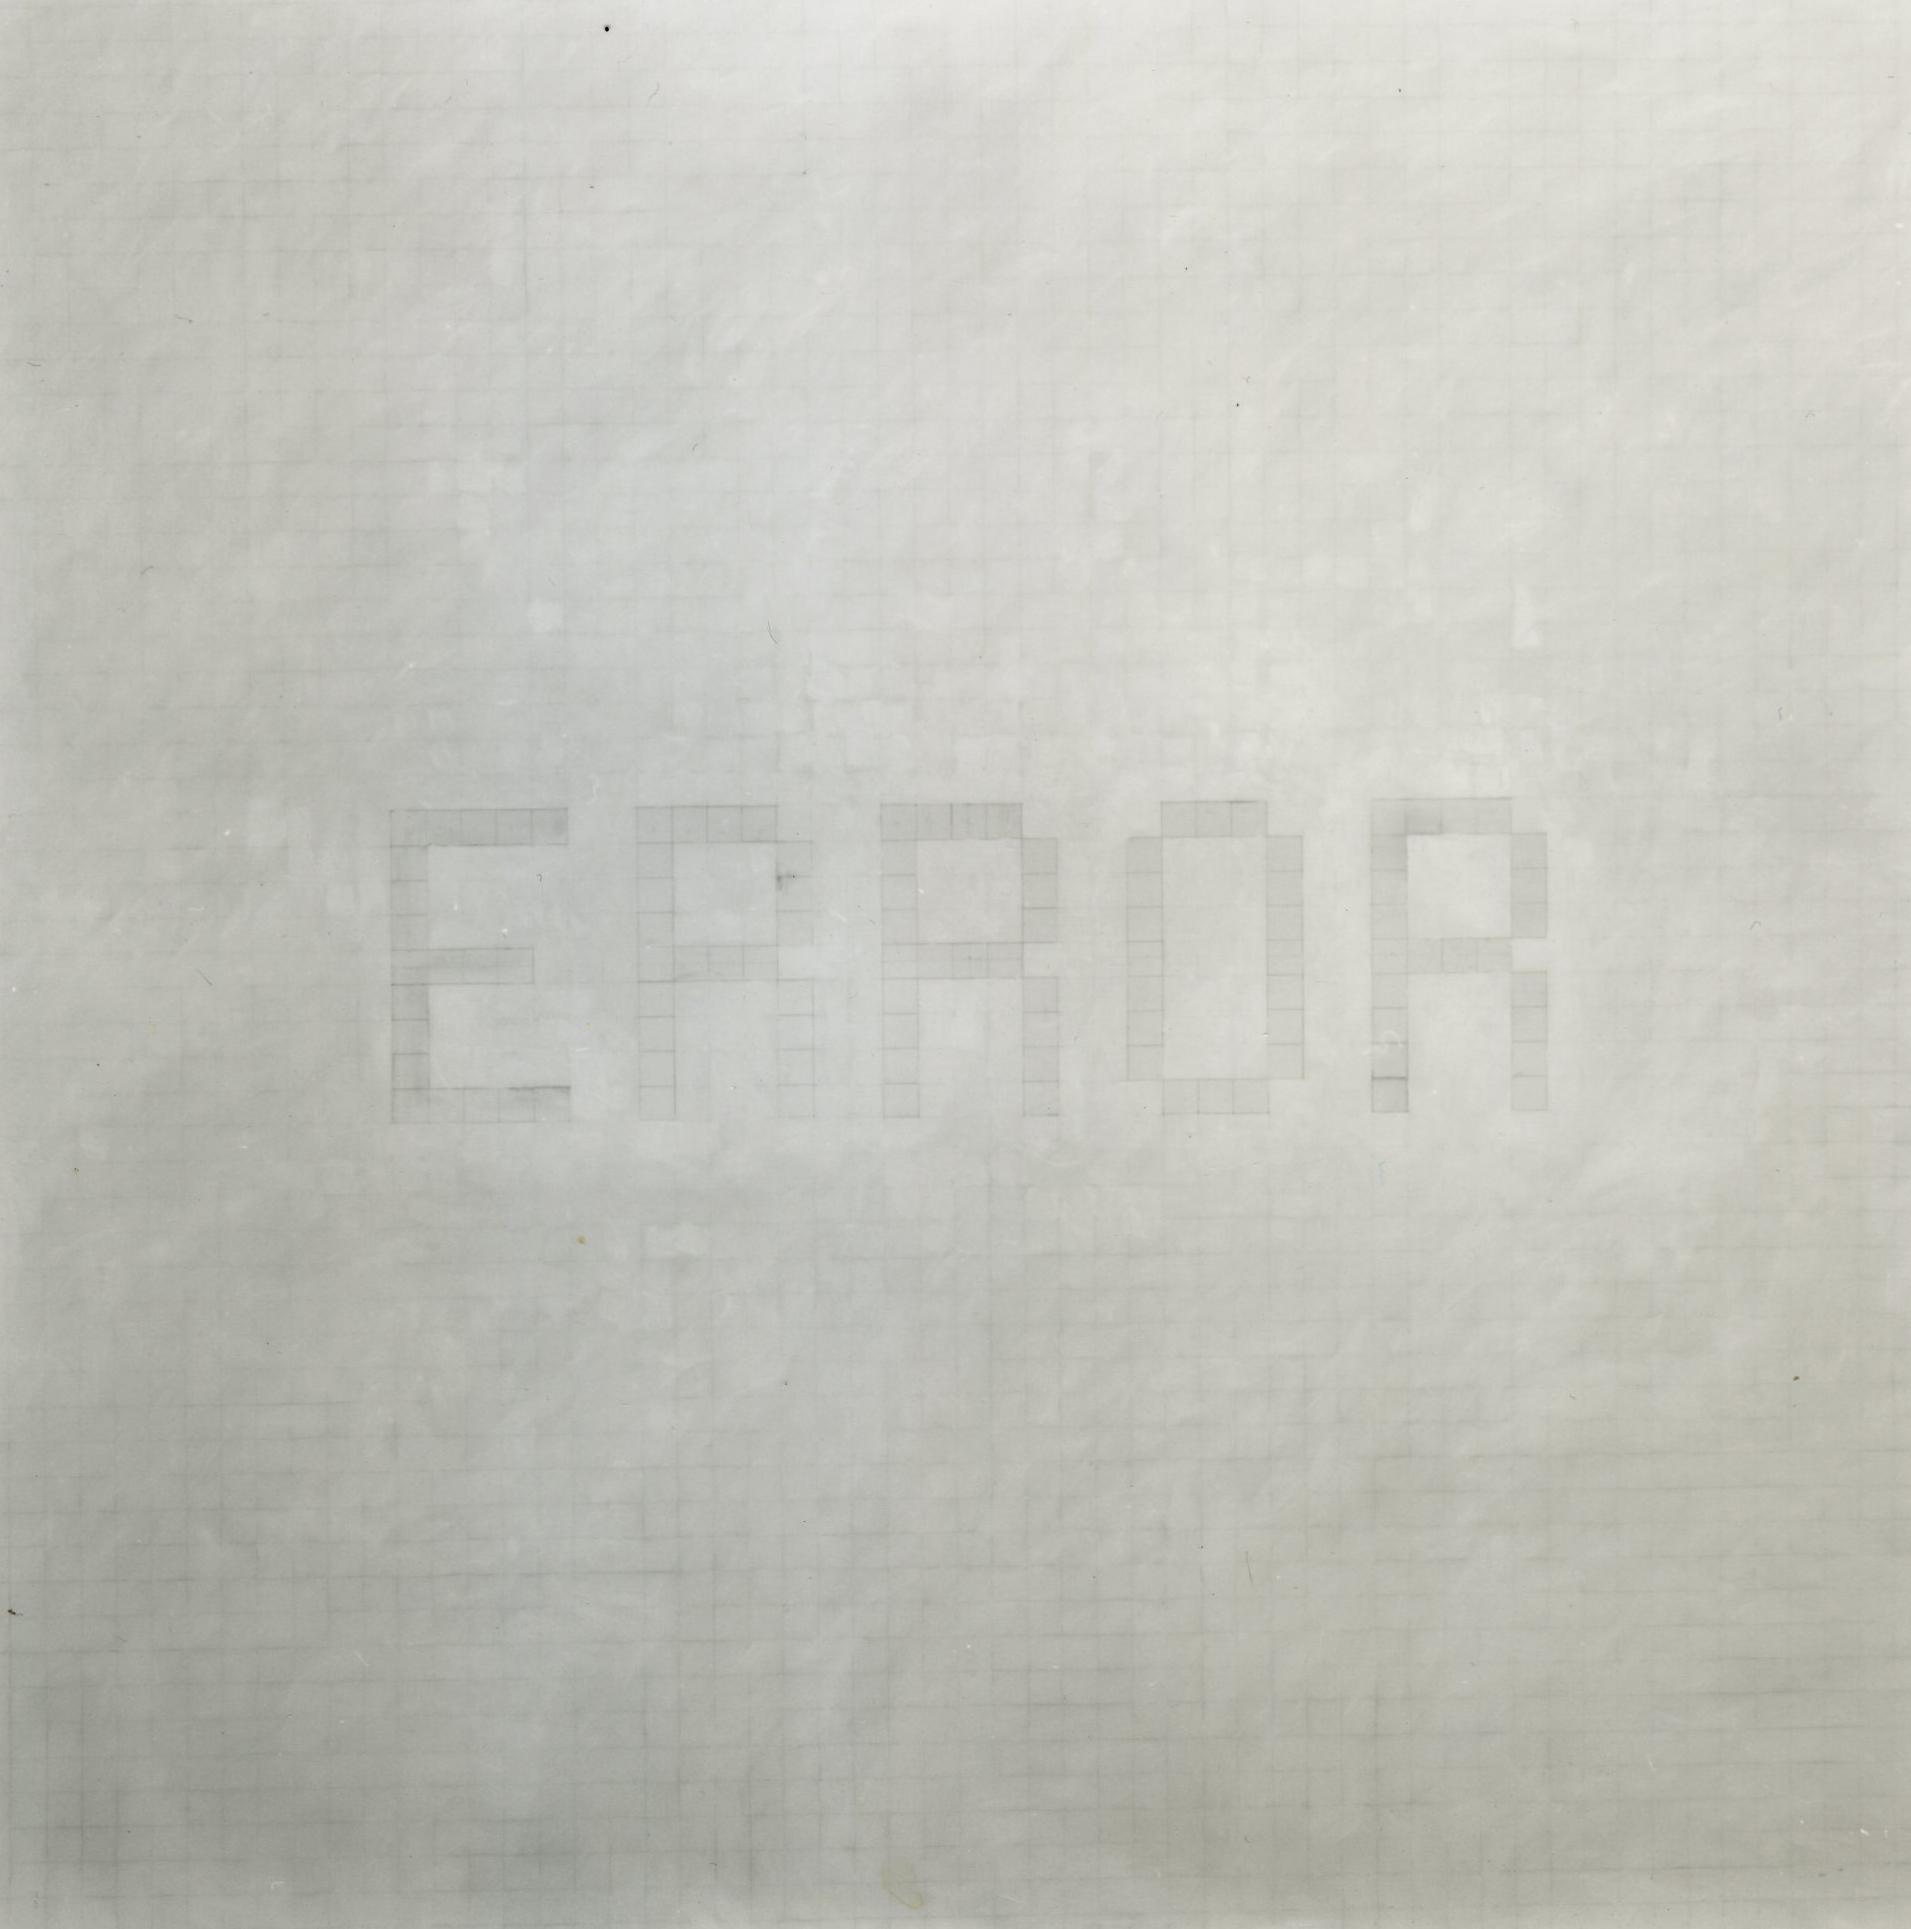 Luca Pancrazzi, Error, 2000, pencil on paper, 200×200 cm